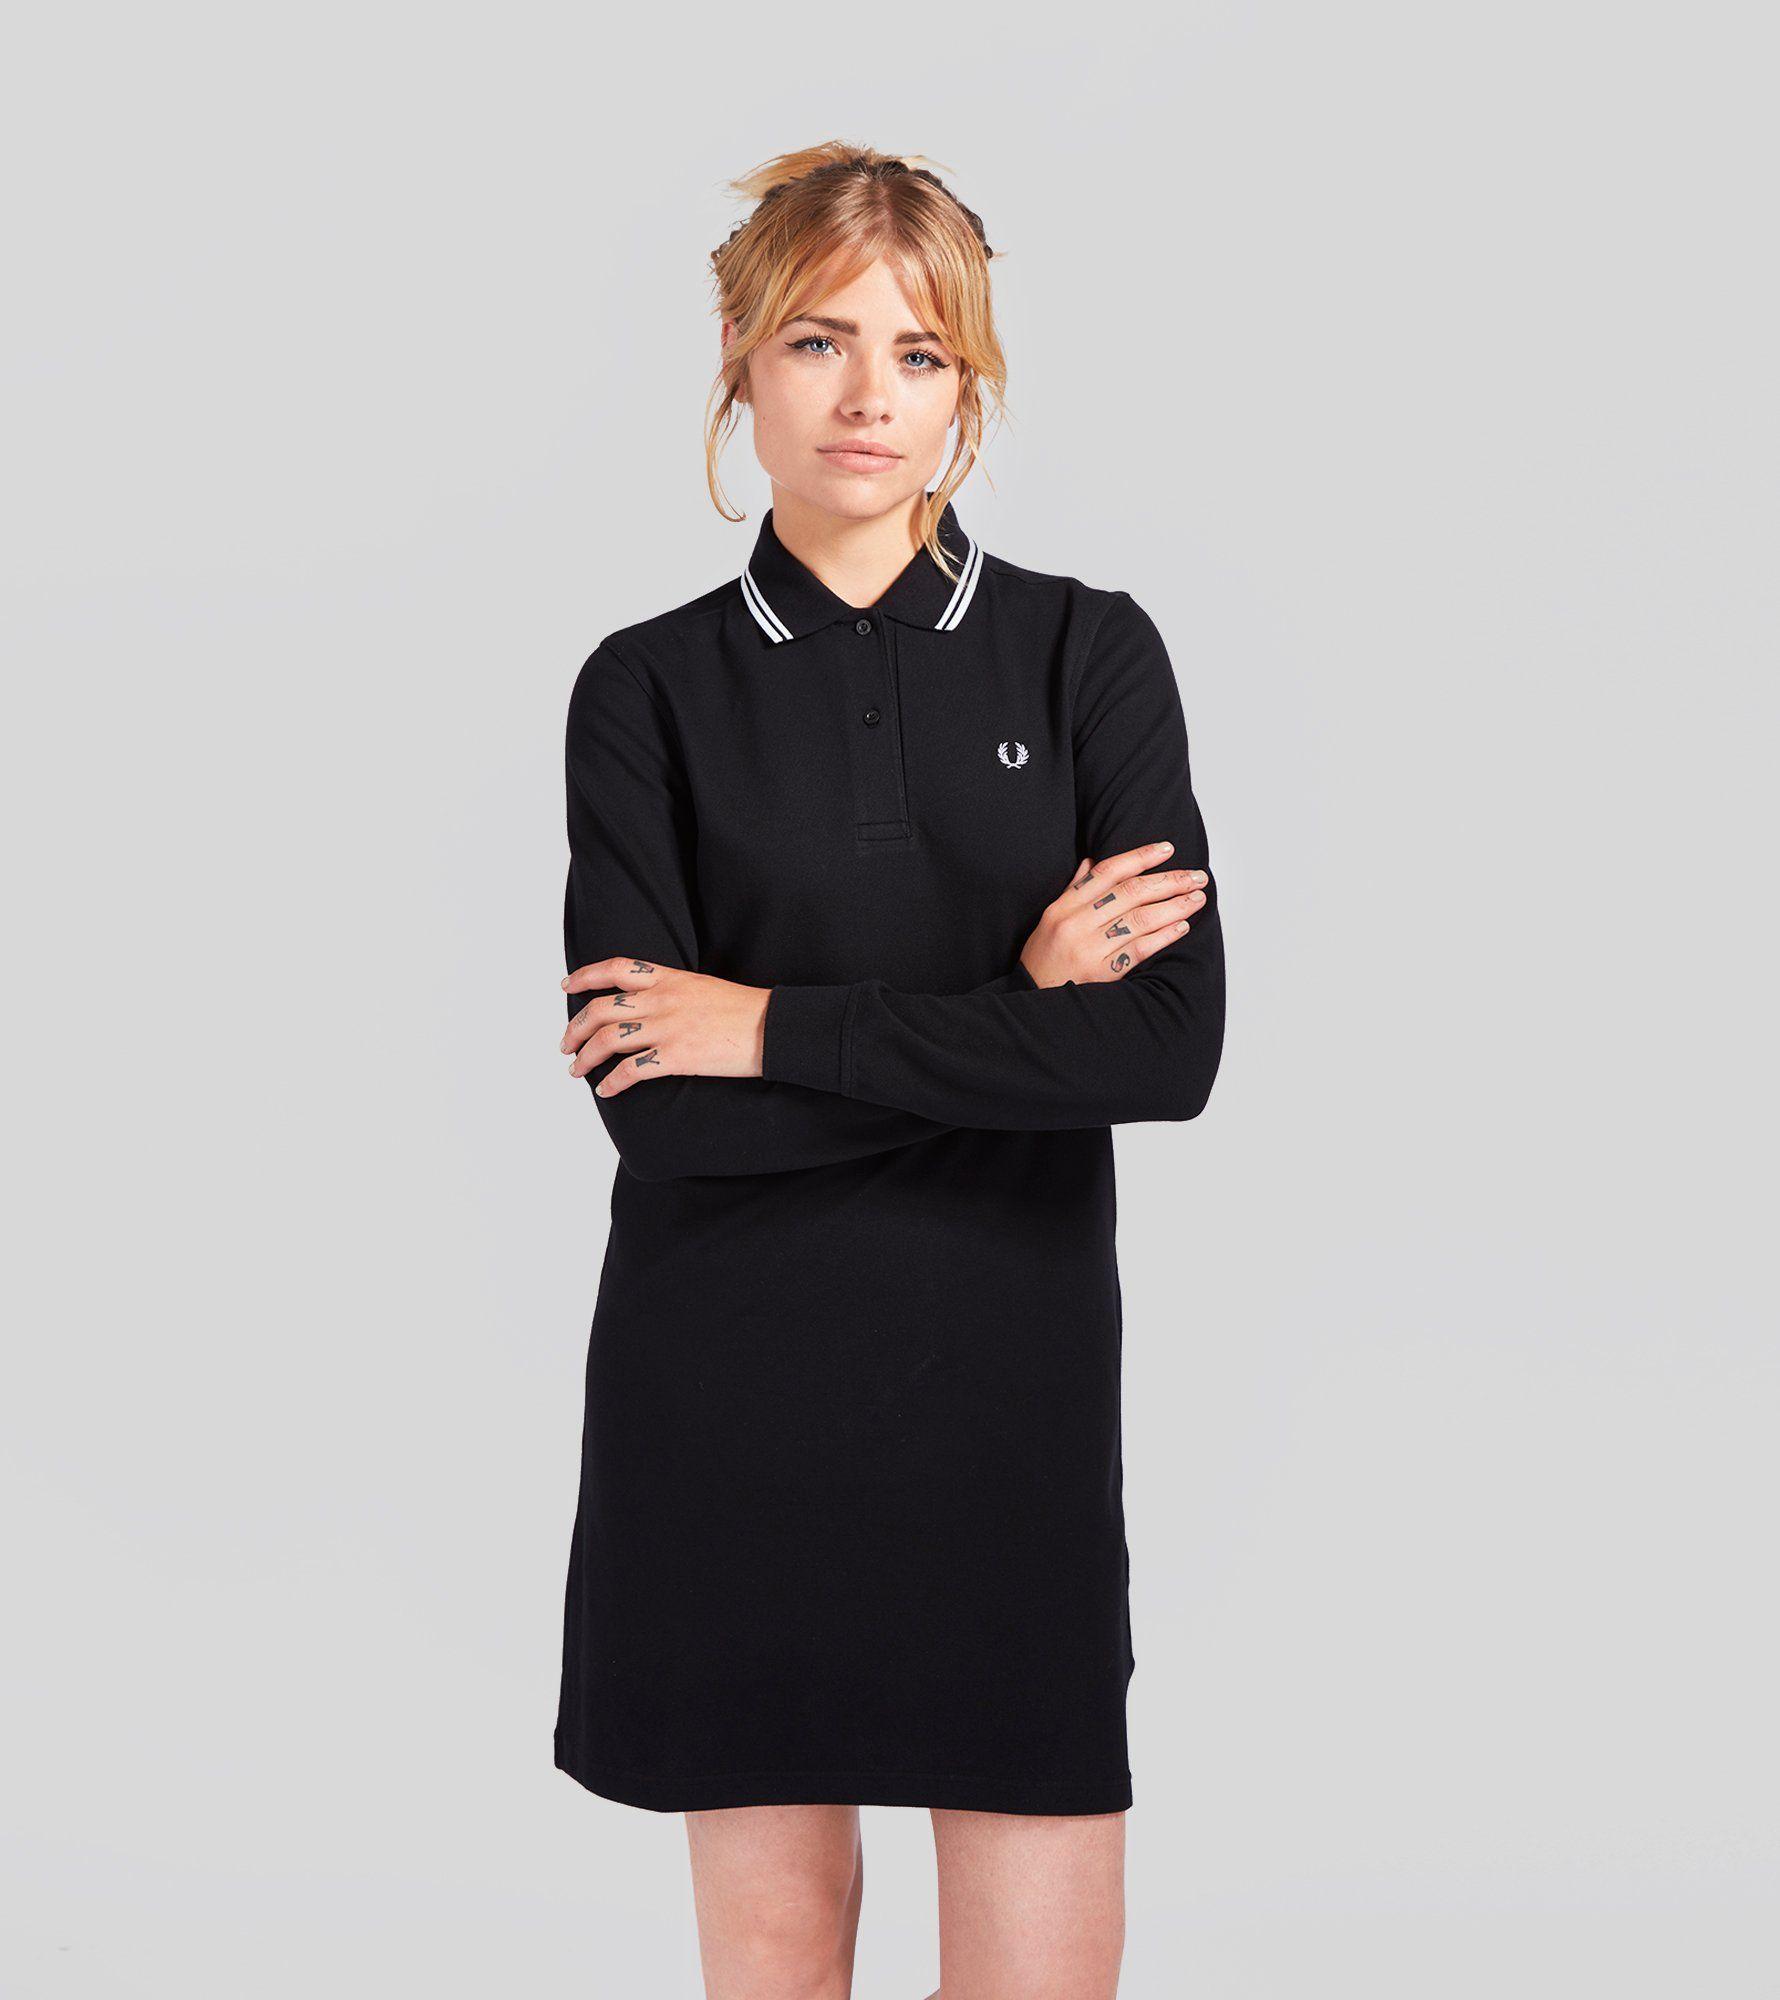 0a3c1e12aeaa Womens Long Sleeved Black Dress - raveitsafe